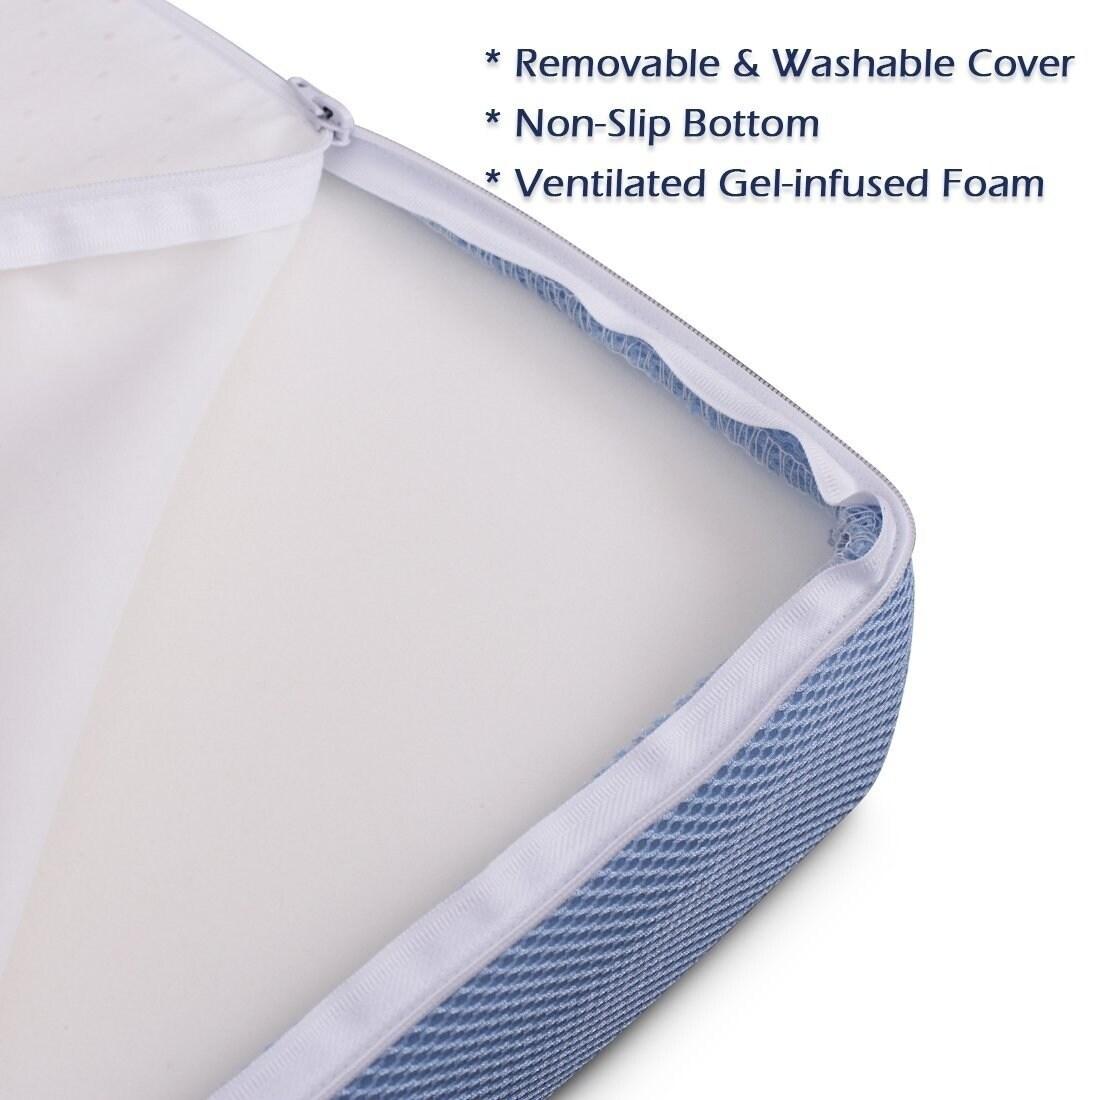 Cr Sleep 3 Inch Twin Size Tri Folding Memory Foam Mattress With